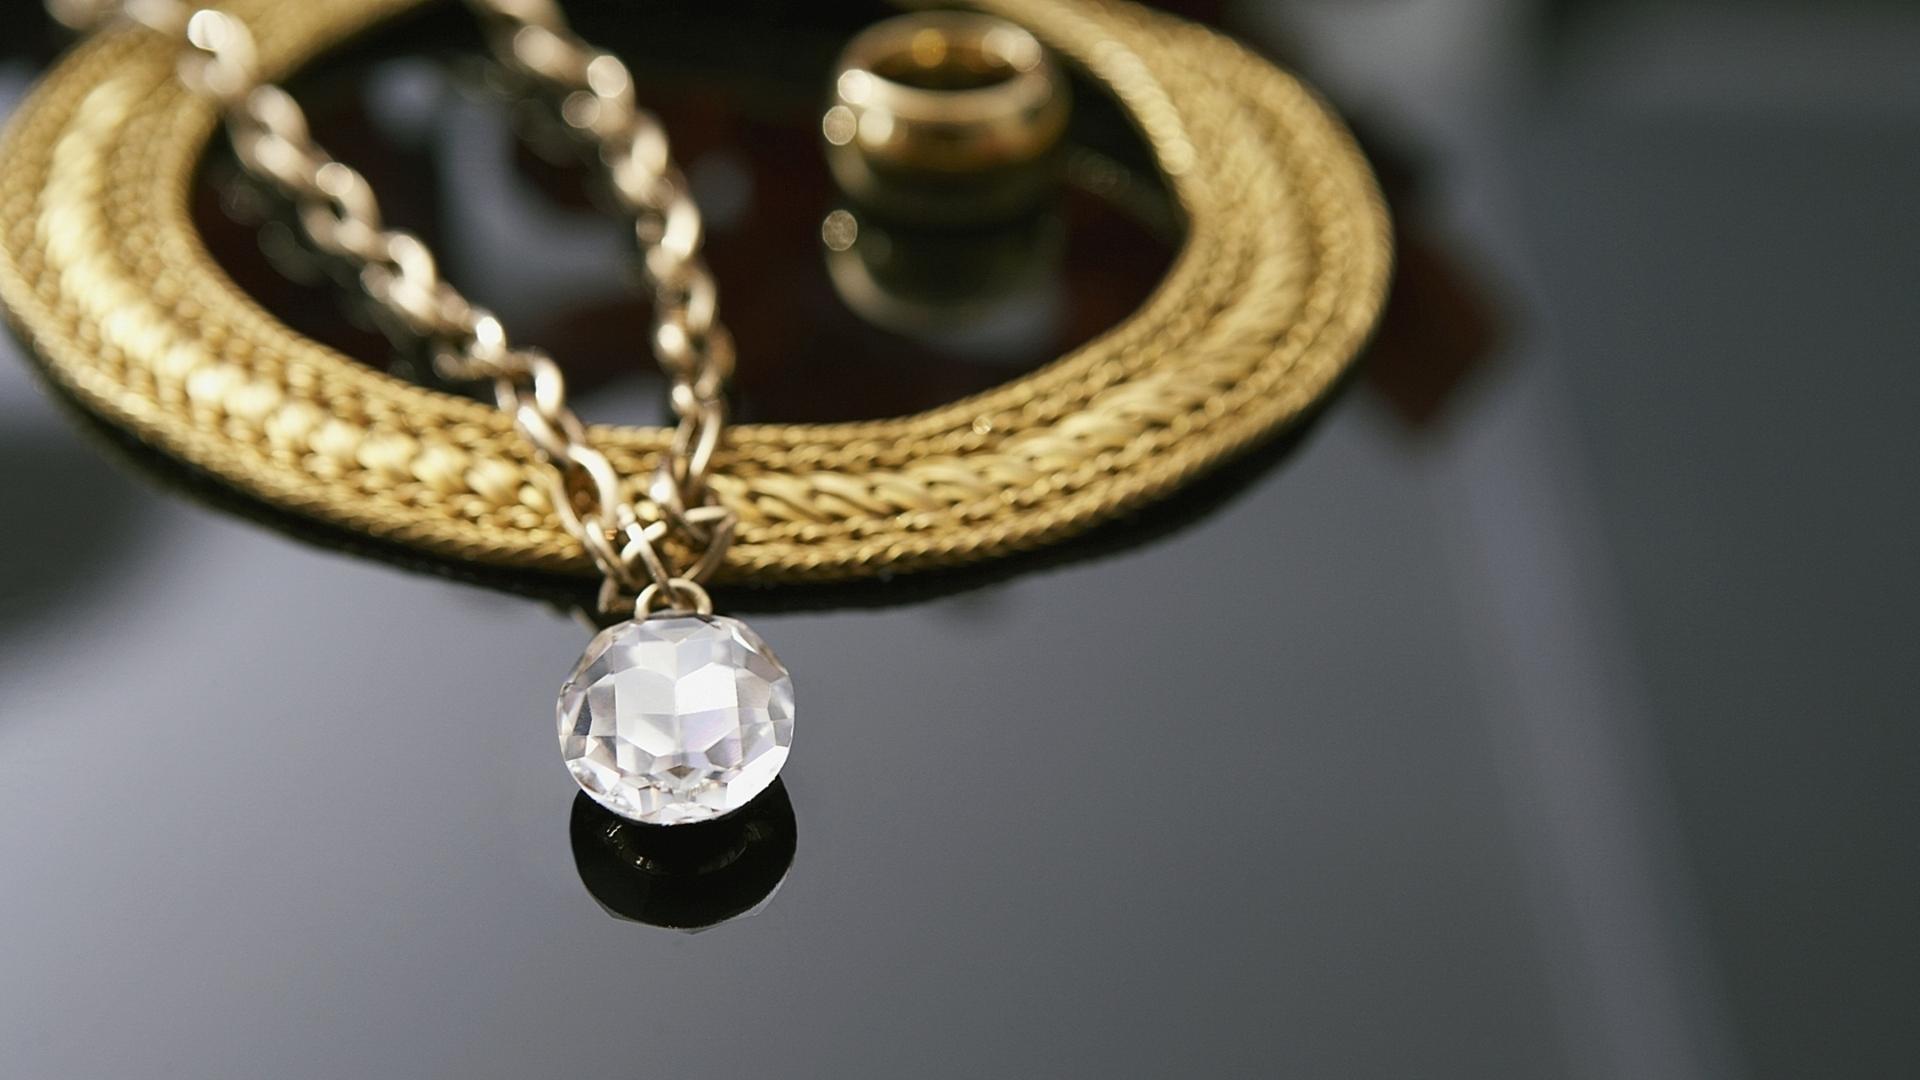 Jewellery Calendar Design : صور مجوهرات دهب والماس من لازوردي وداماس ميكساتك